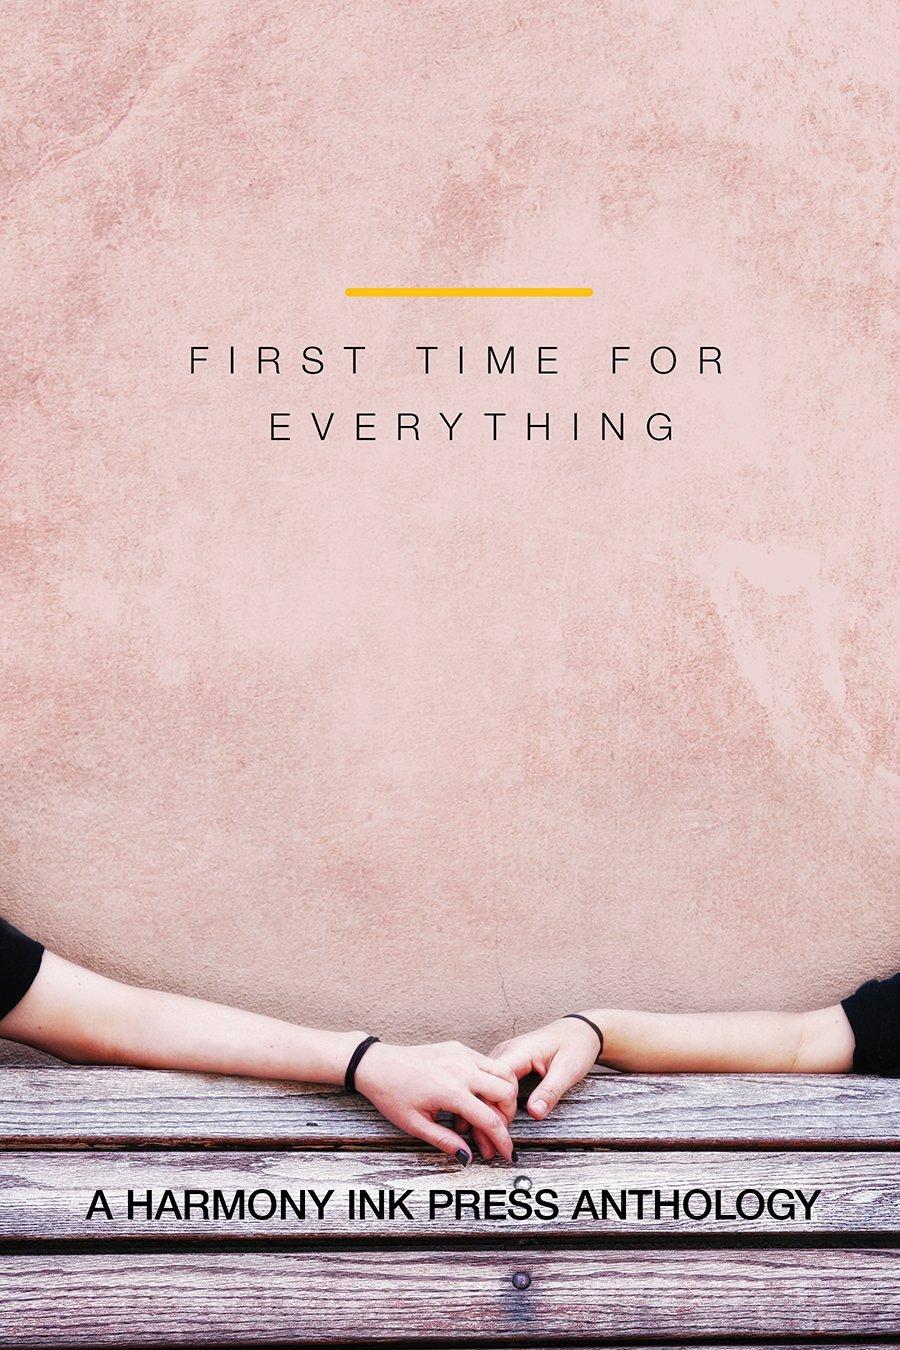 firsttimeforeveryone